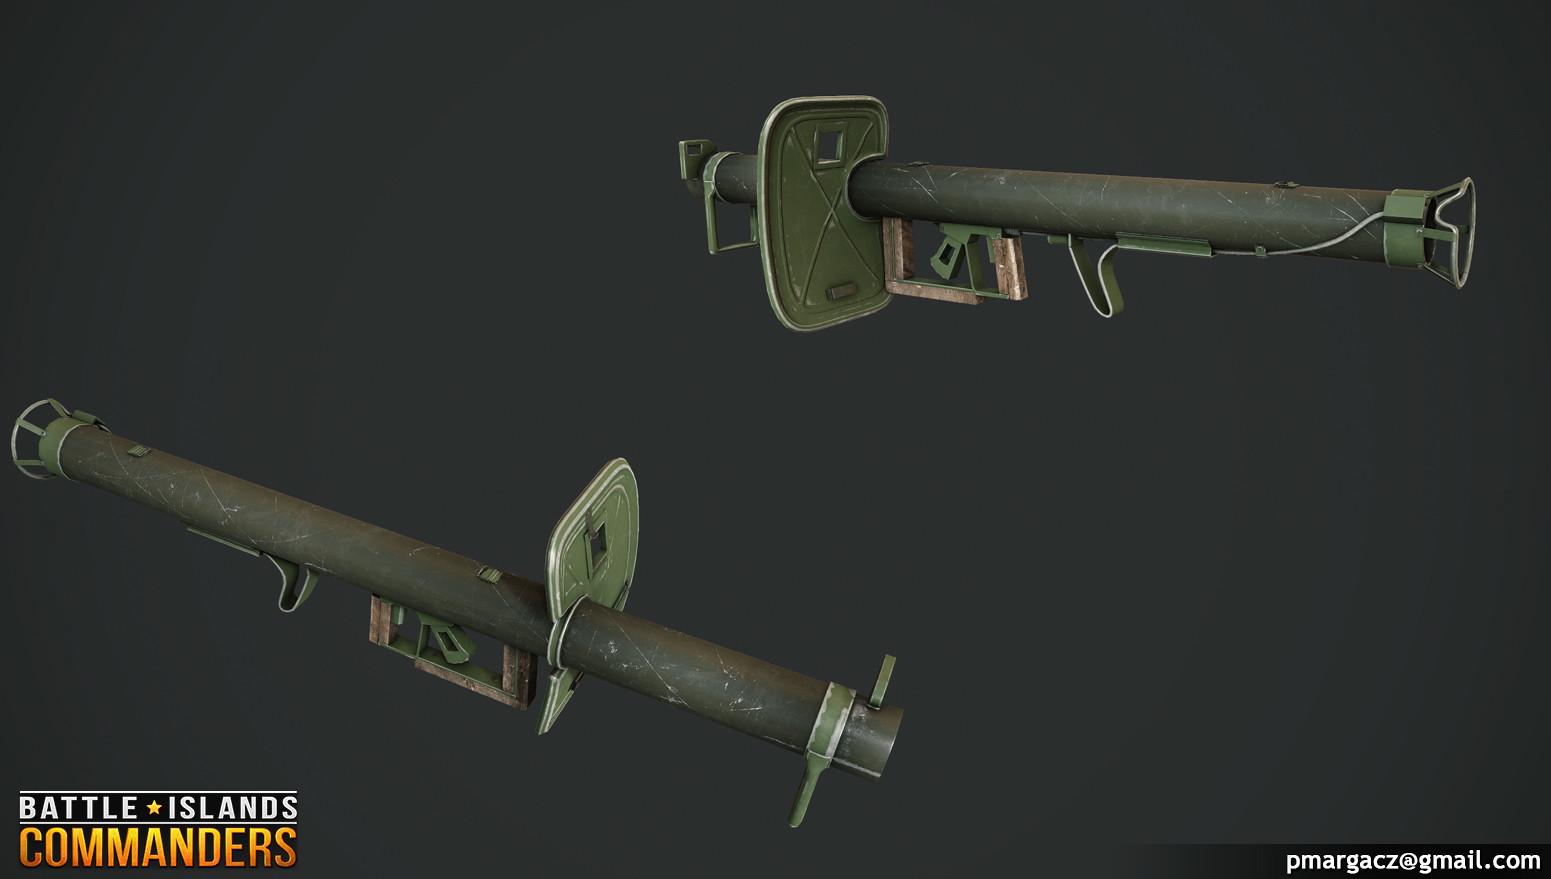 Pawel margacz bazooka